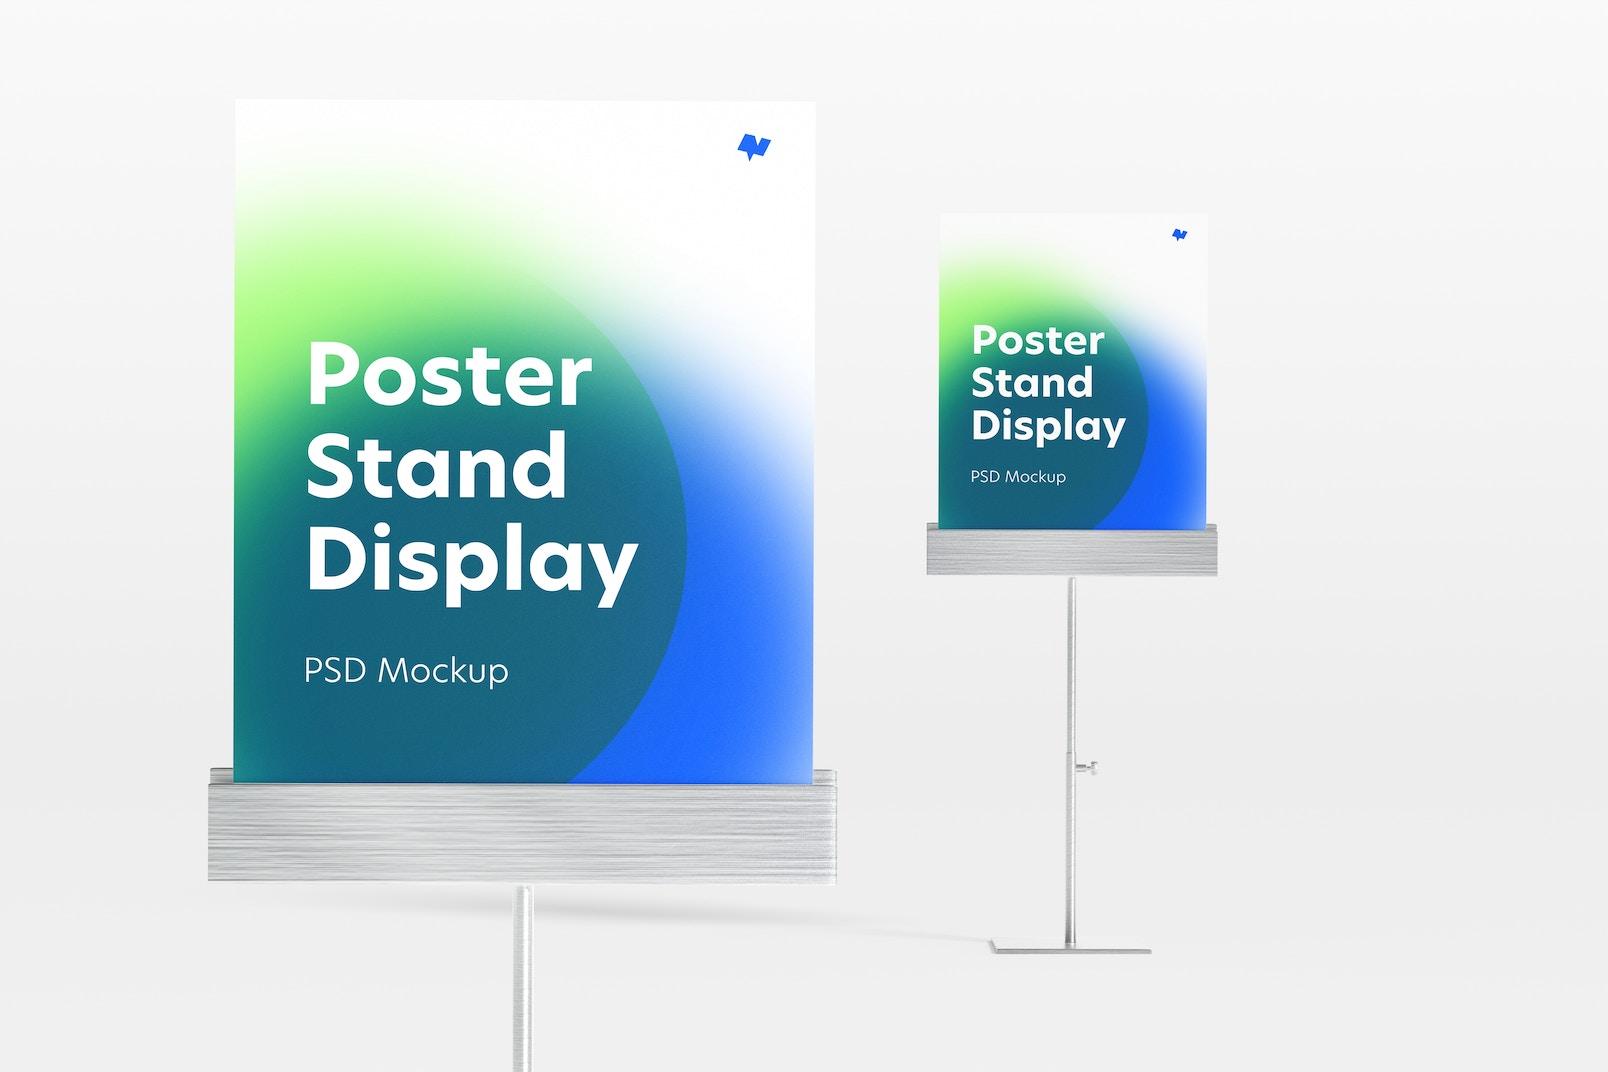 Metallic Poster Stands Display Mockup, Close-Up